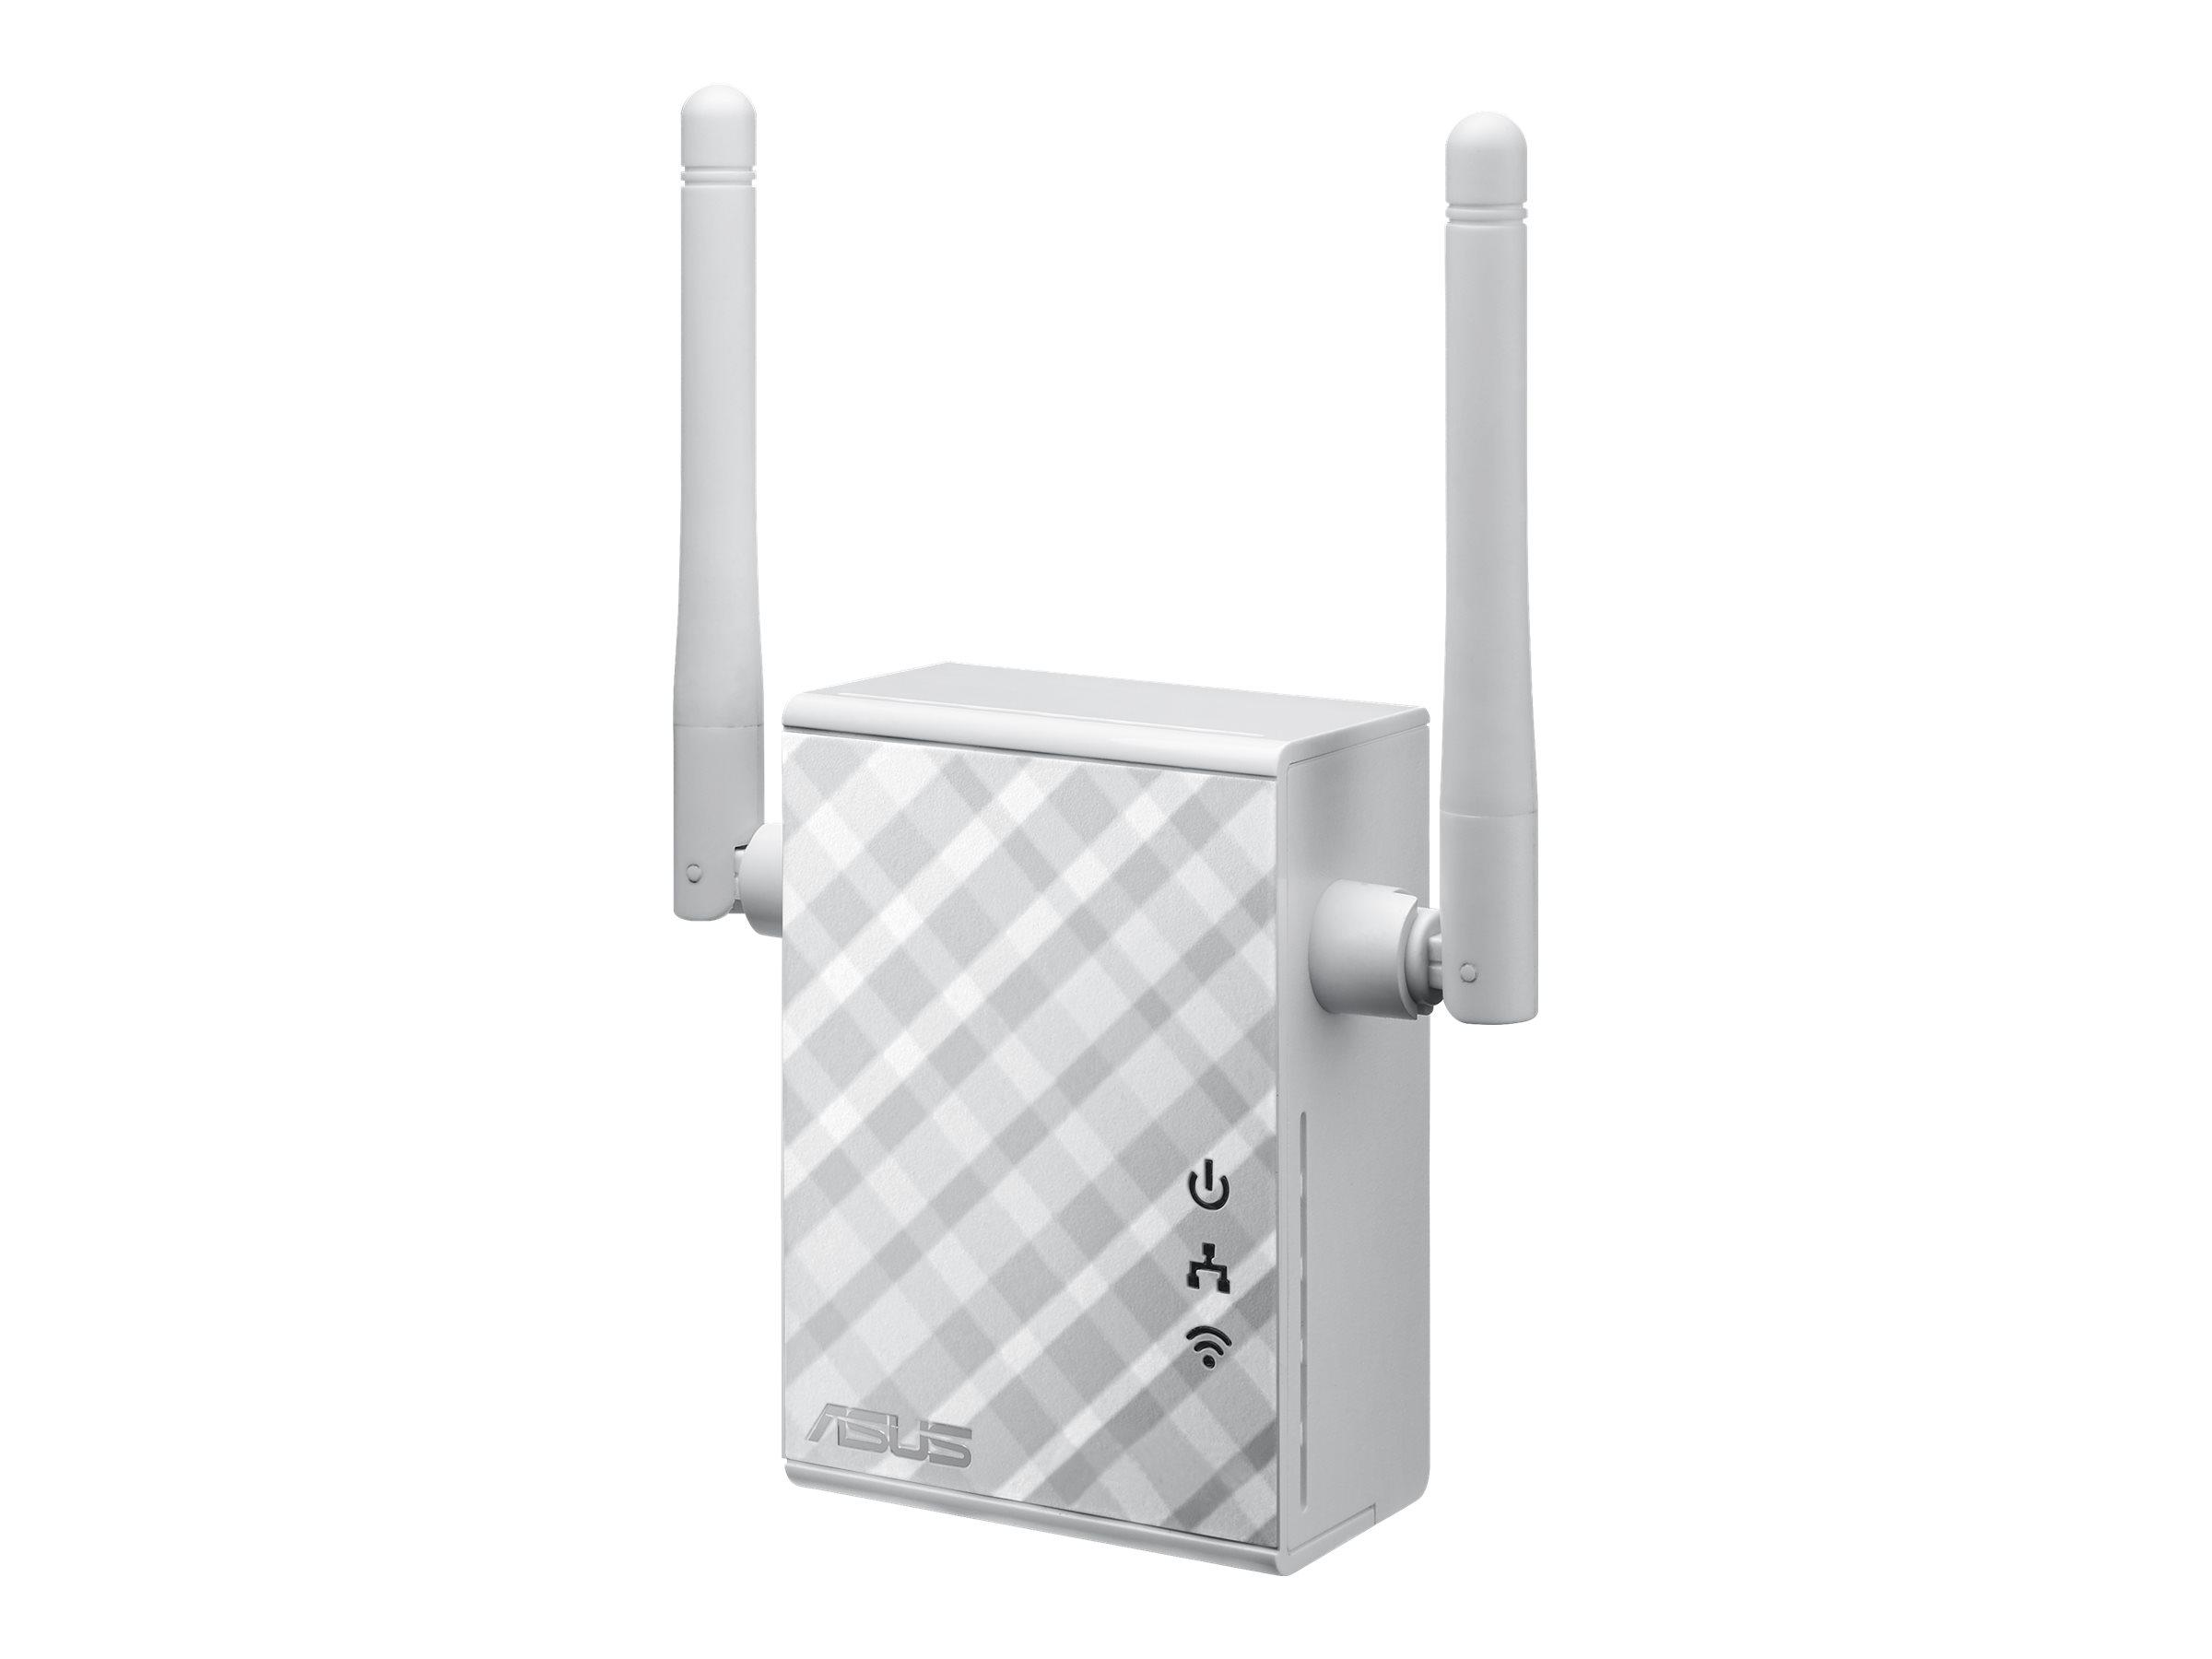 ASUS RP-N12 - Wi-Fi-Range-Extender - Wi-Fi - 2.4 GHz